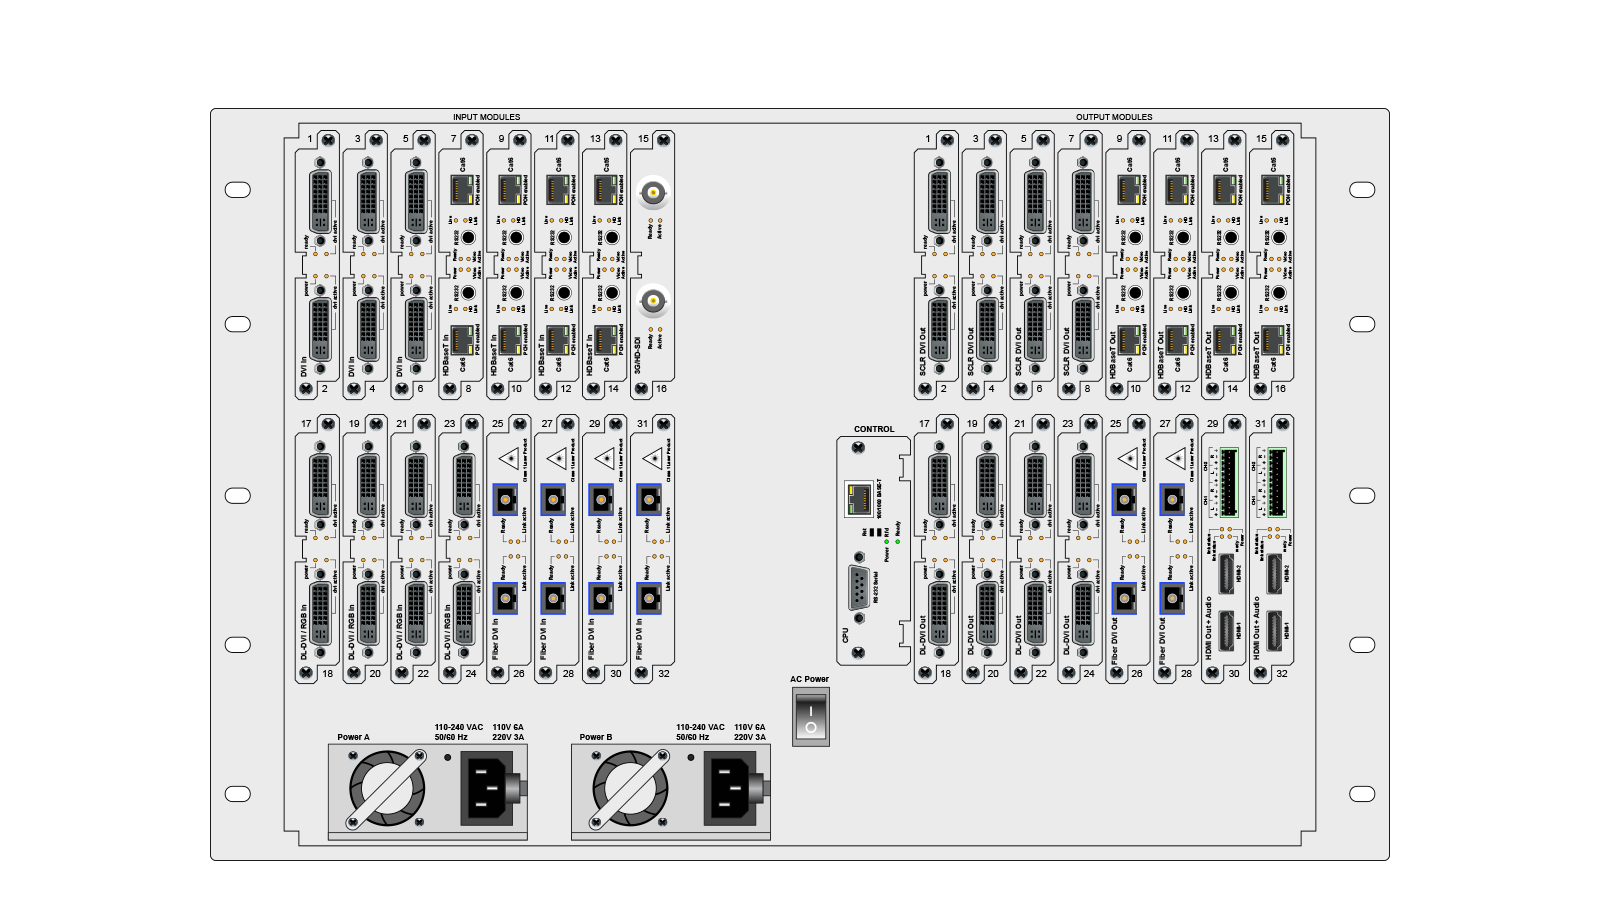 Linx 3400: Back Panel